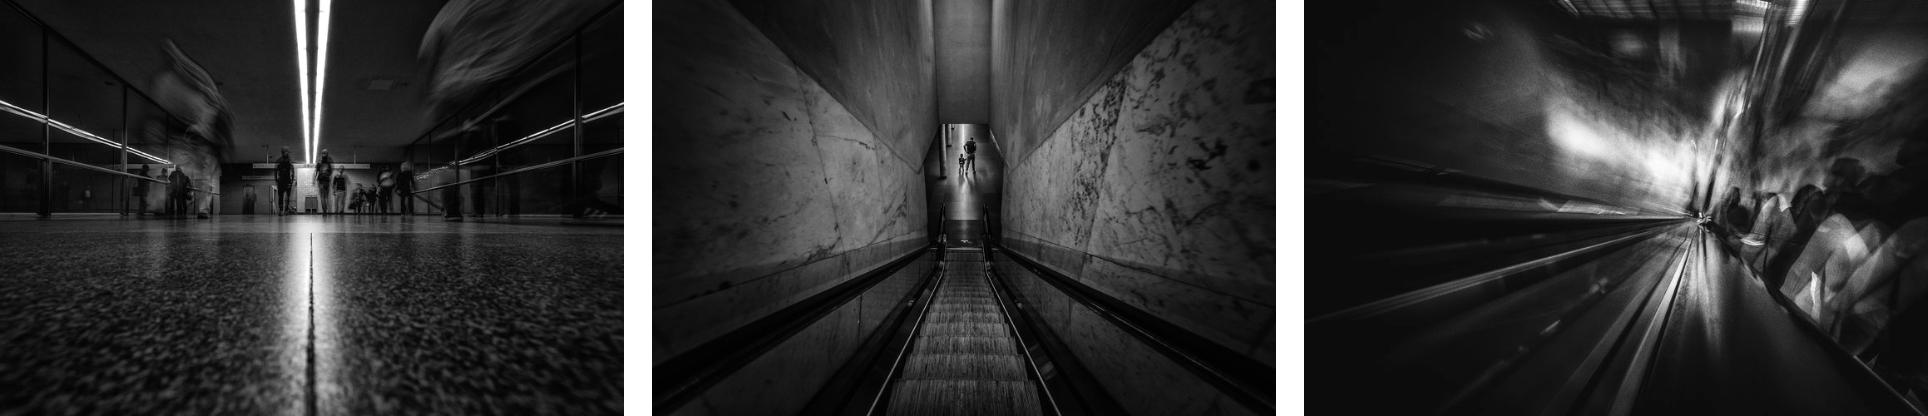 In Transit bonjourmolotov Andre Gigante Photography Experimenta Design 07.png